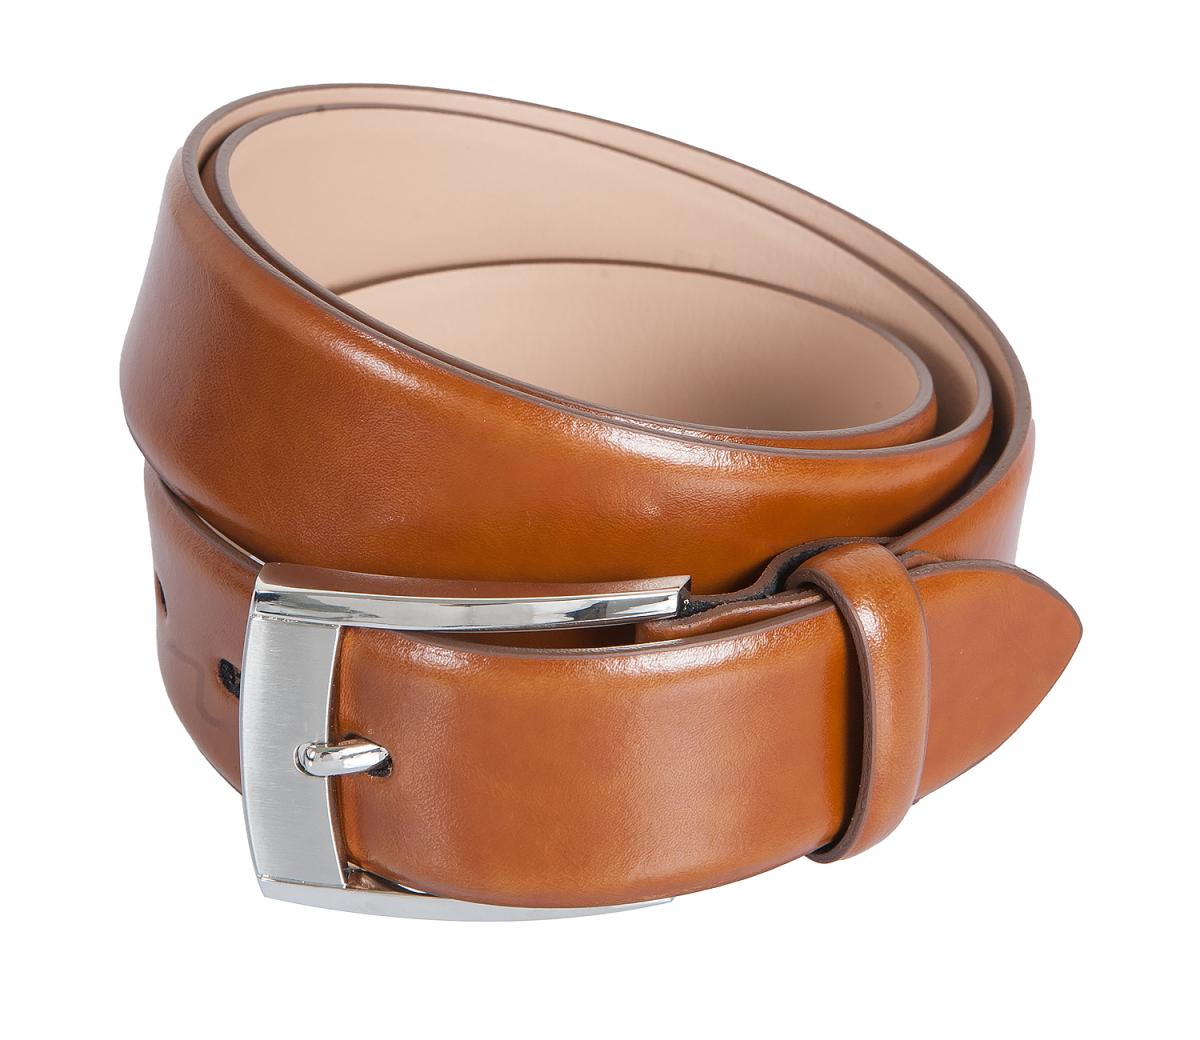 LLOYD Men s Belts Gürtel Herrengürtel Ledergürtel Braun Cognac 6830 ... e29984d8d0